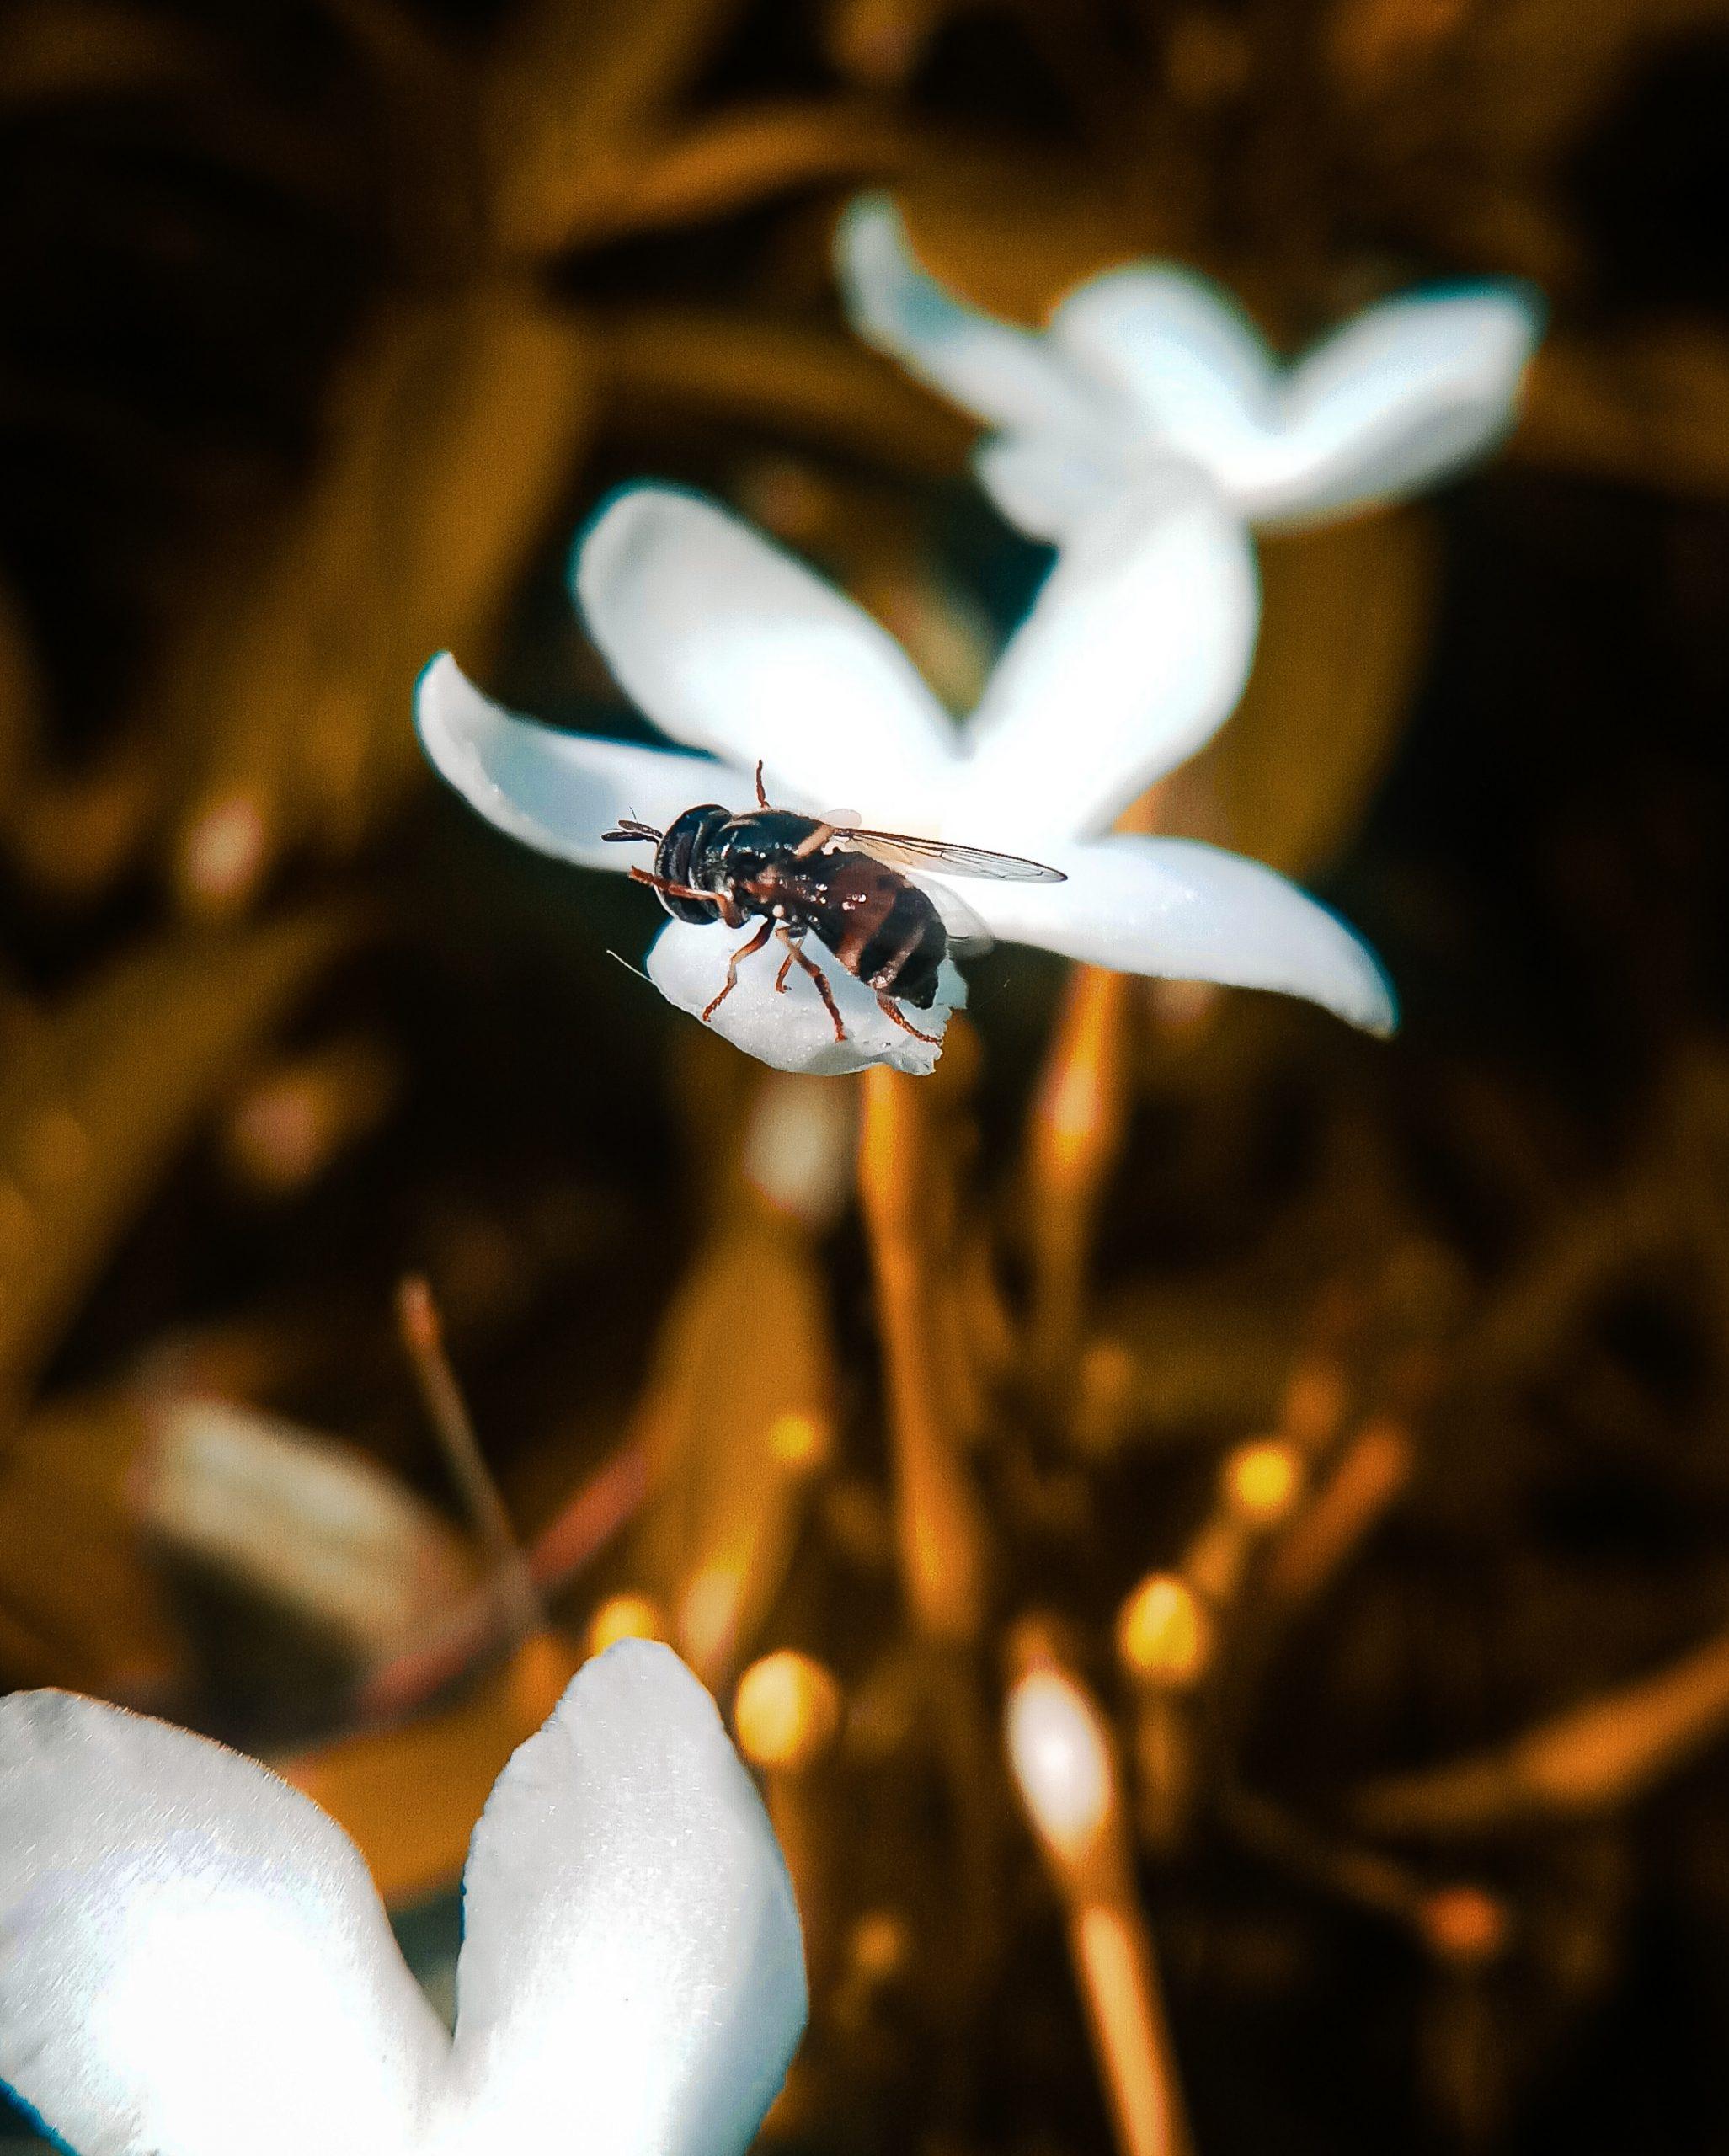 A honeybee on a flower